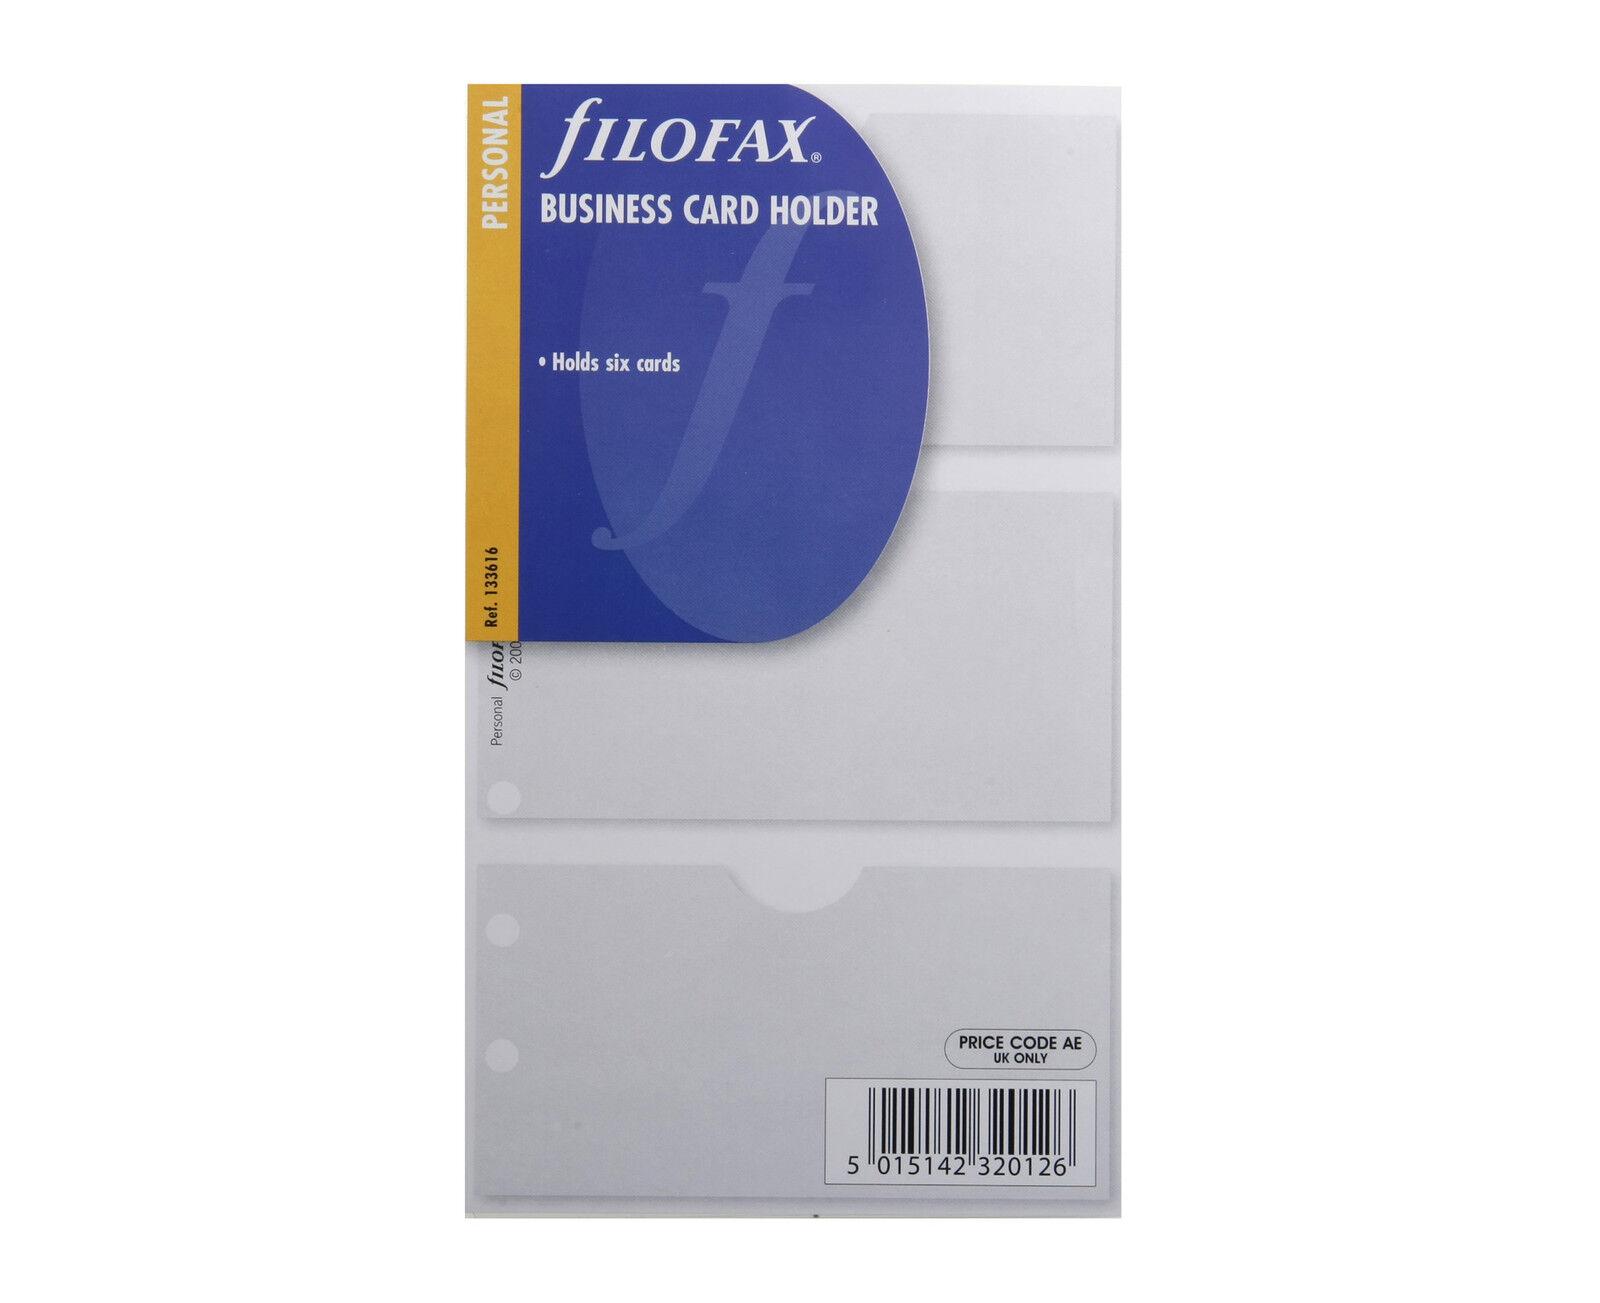 Filofax Personal Size Organiser Business Card Holder Insert Refill ...